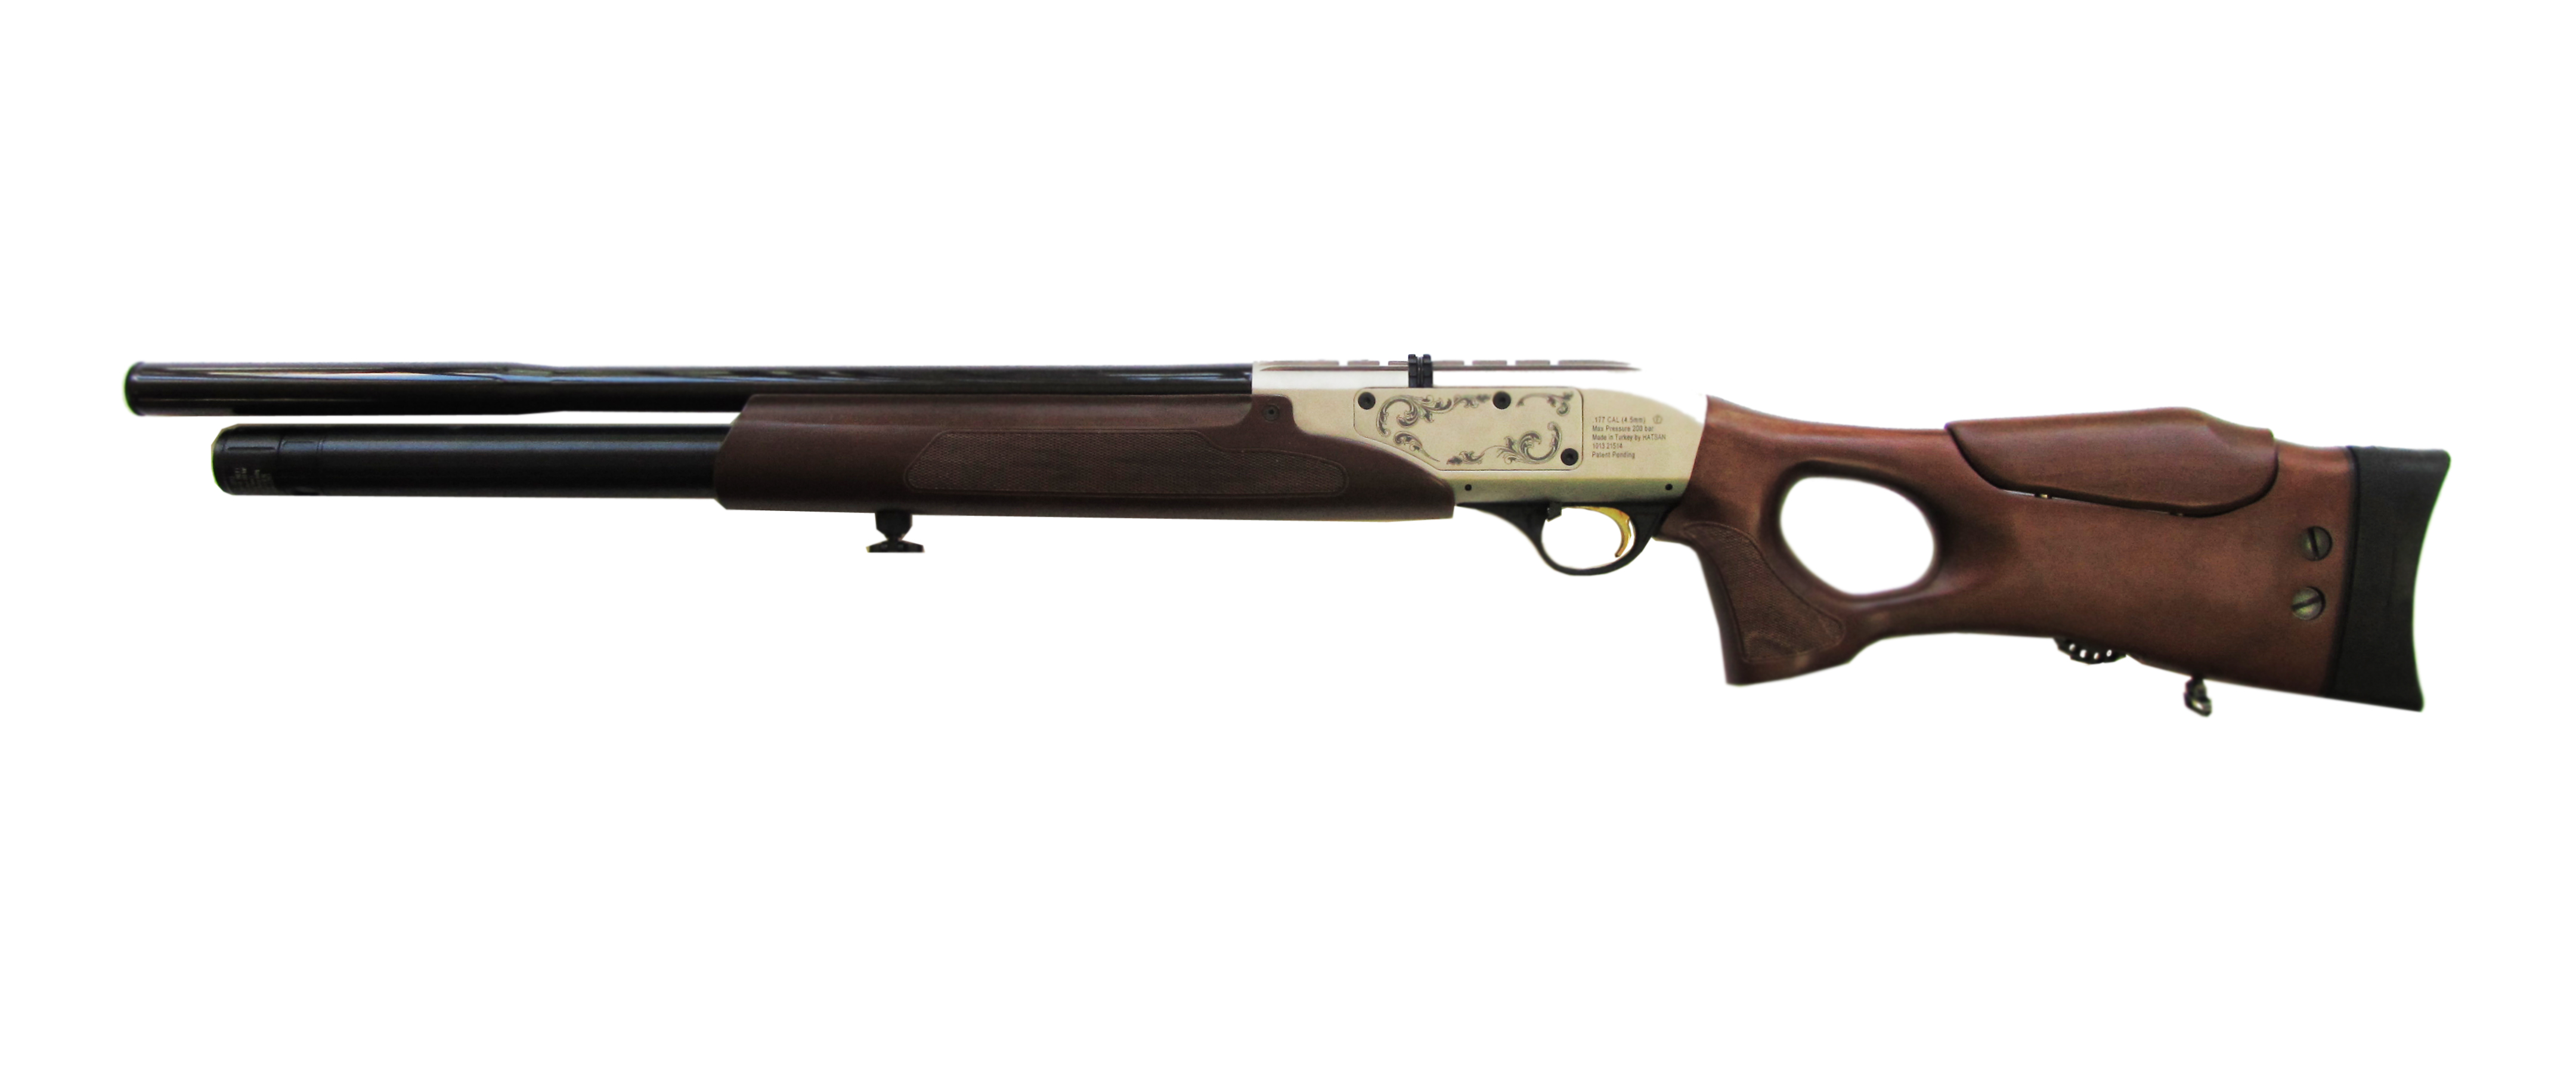 2)Пневматическая винтовка Hatsan Galatian1 Carbine 4,5 мм